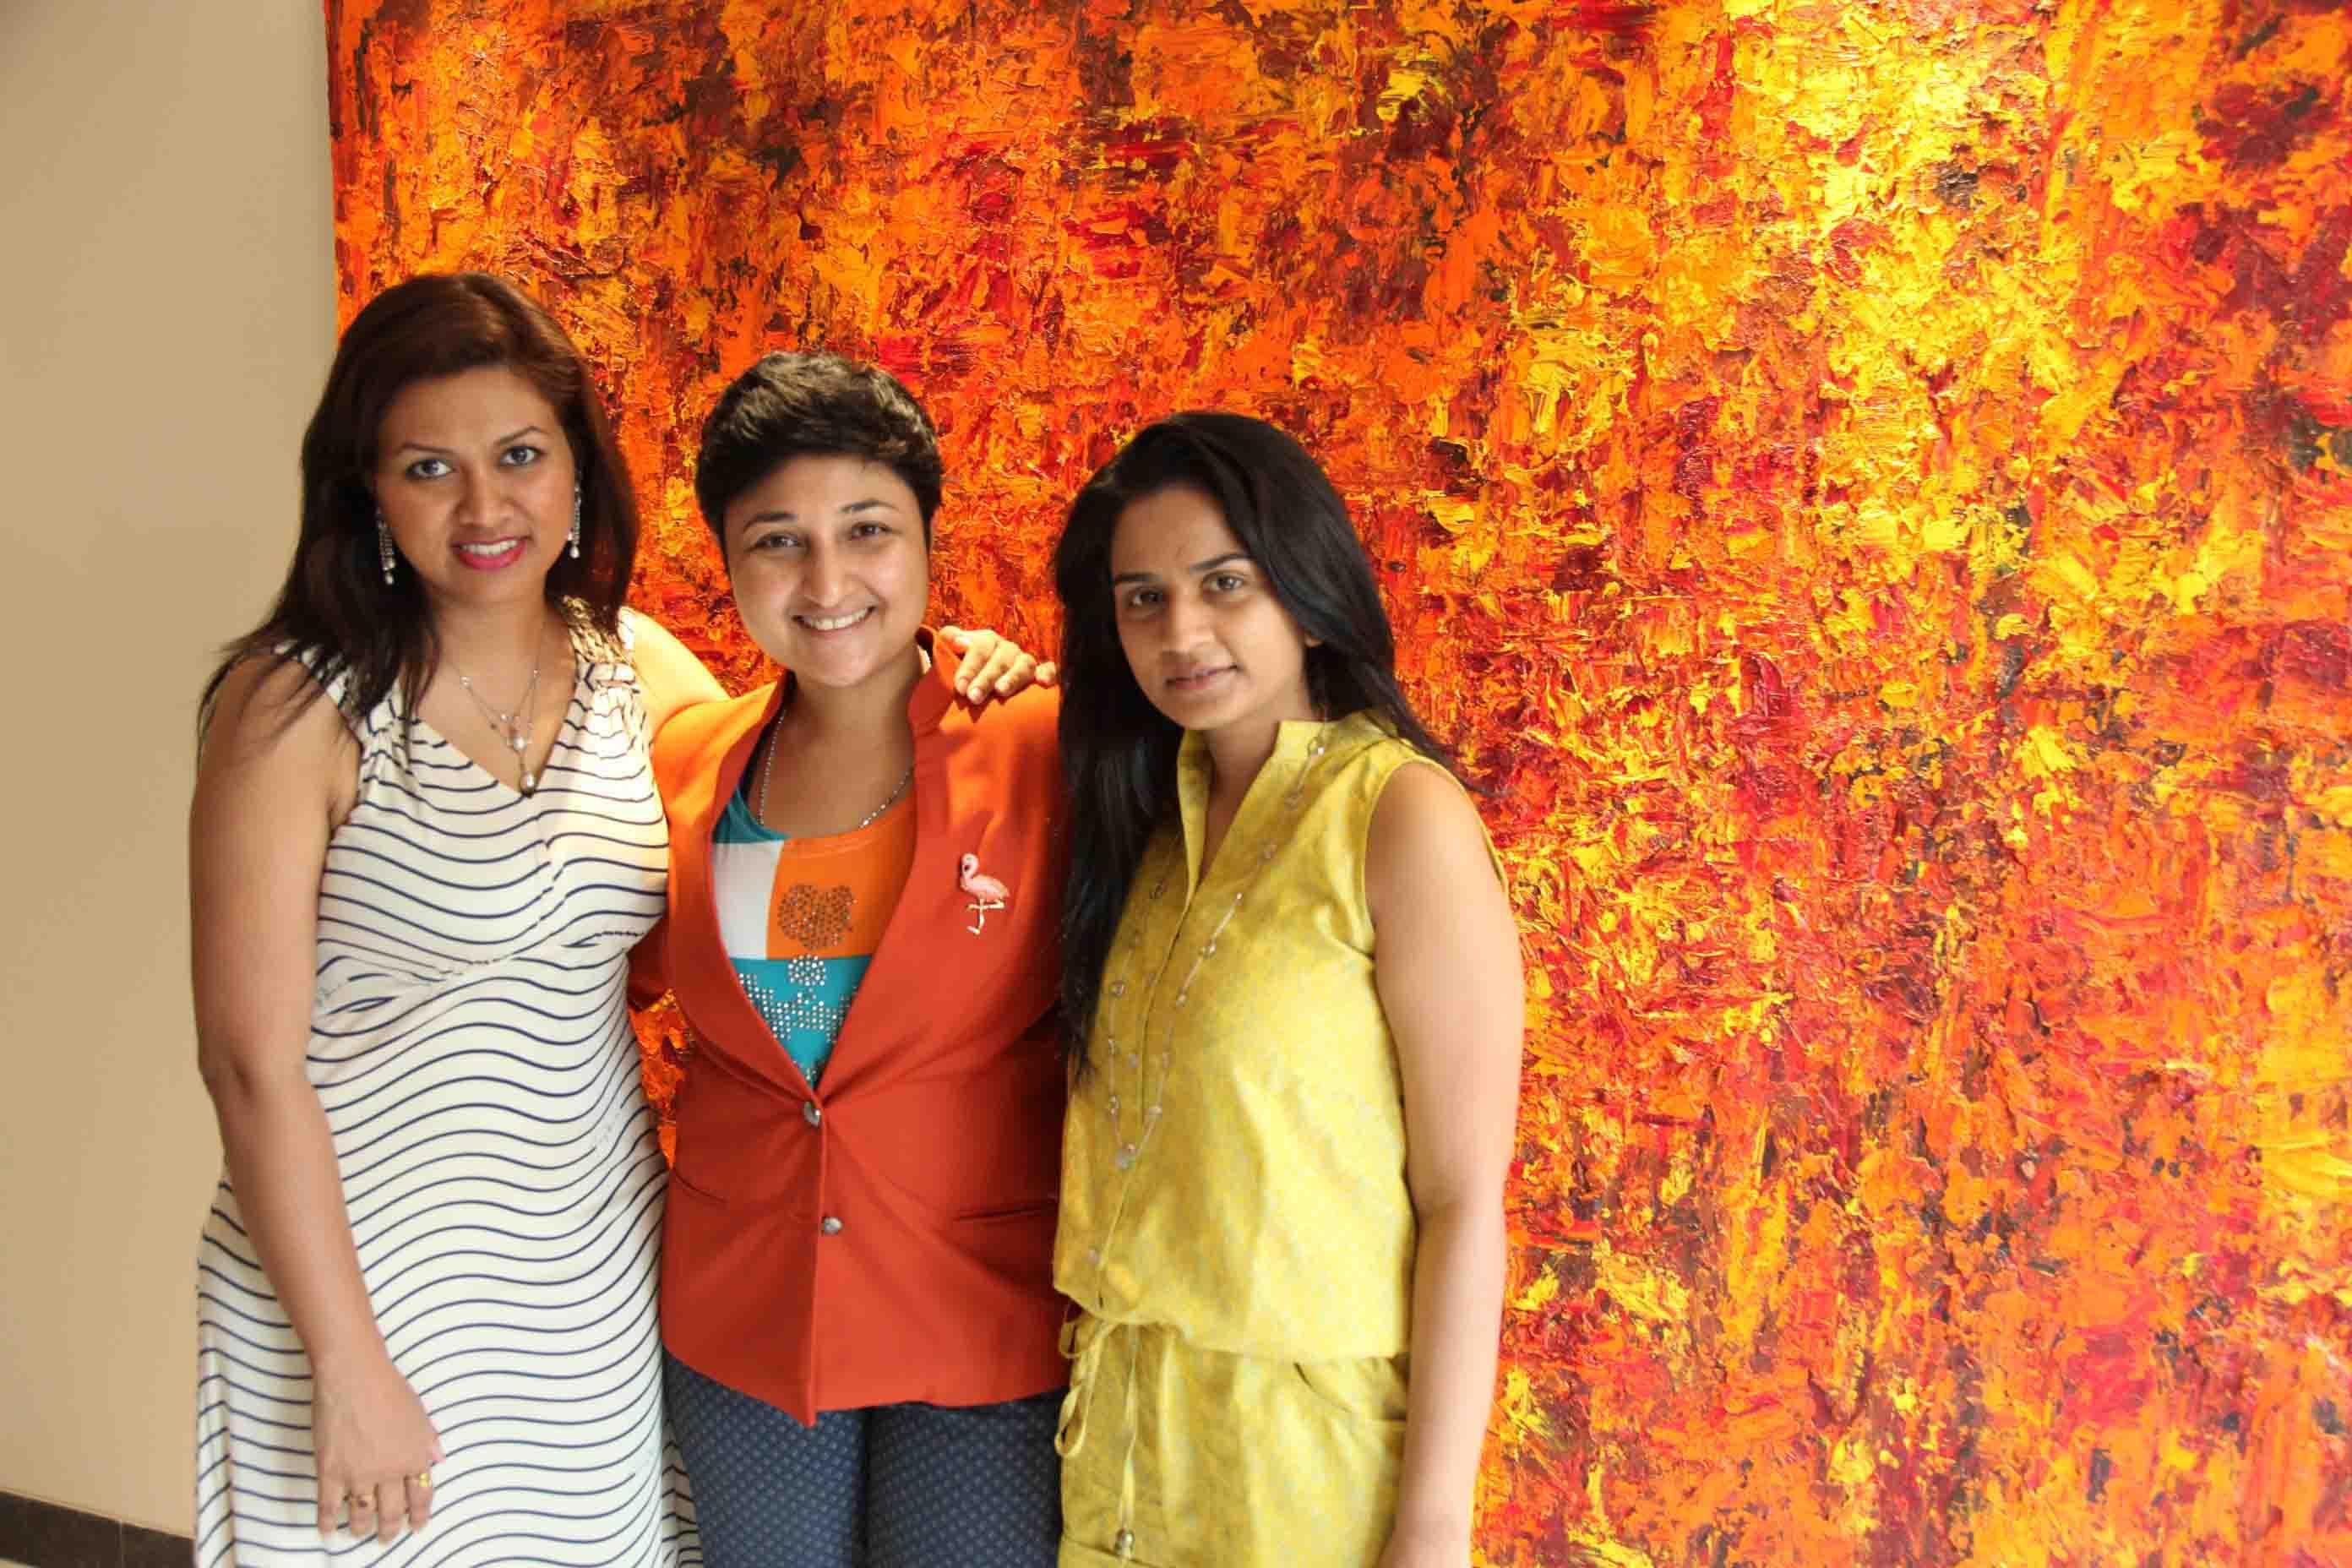 Saloni Doshi and Devita Saraf, Sharmistha Ray, Bellevue Brunches, Arty Hearty